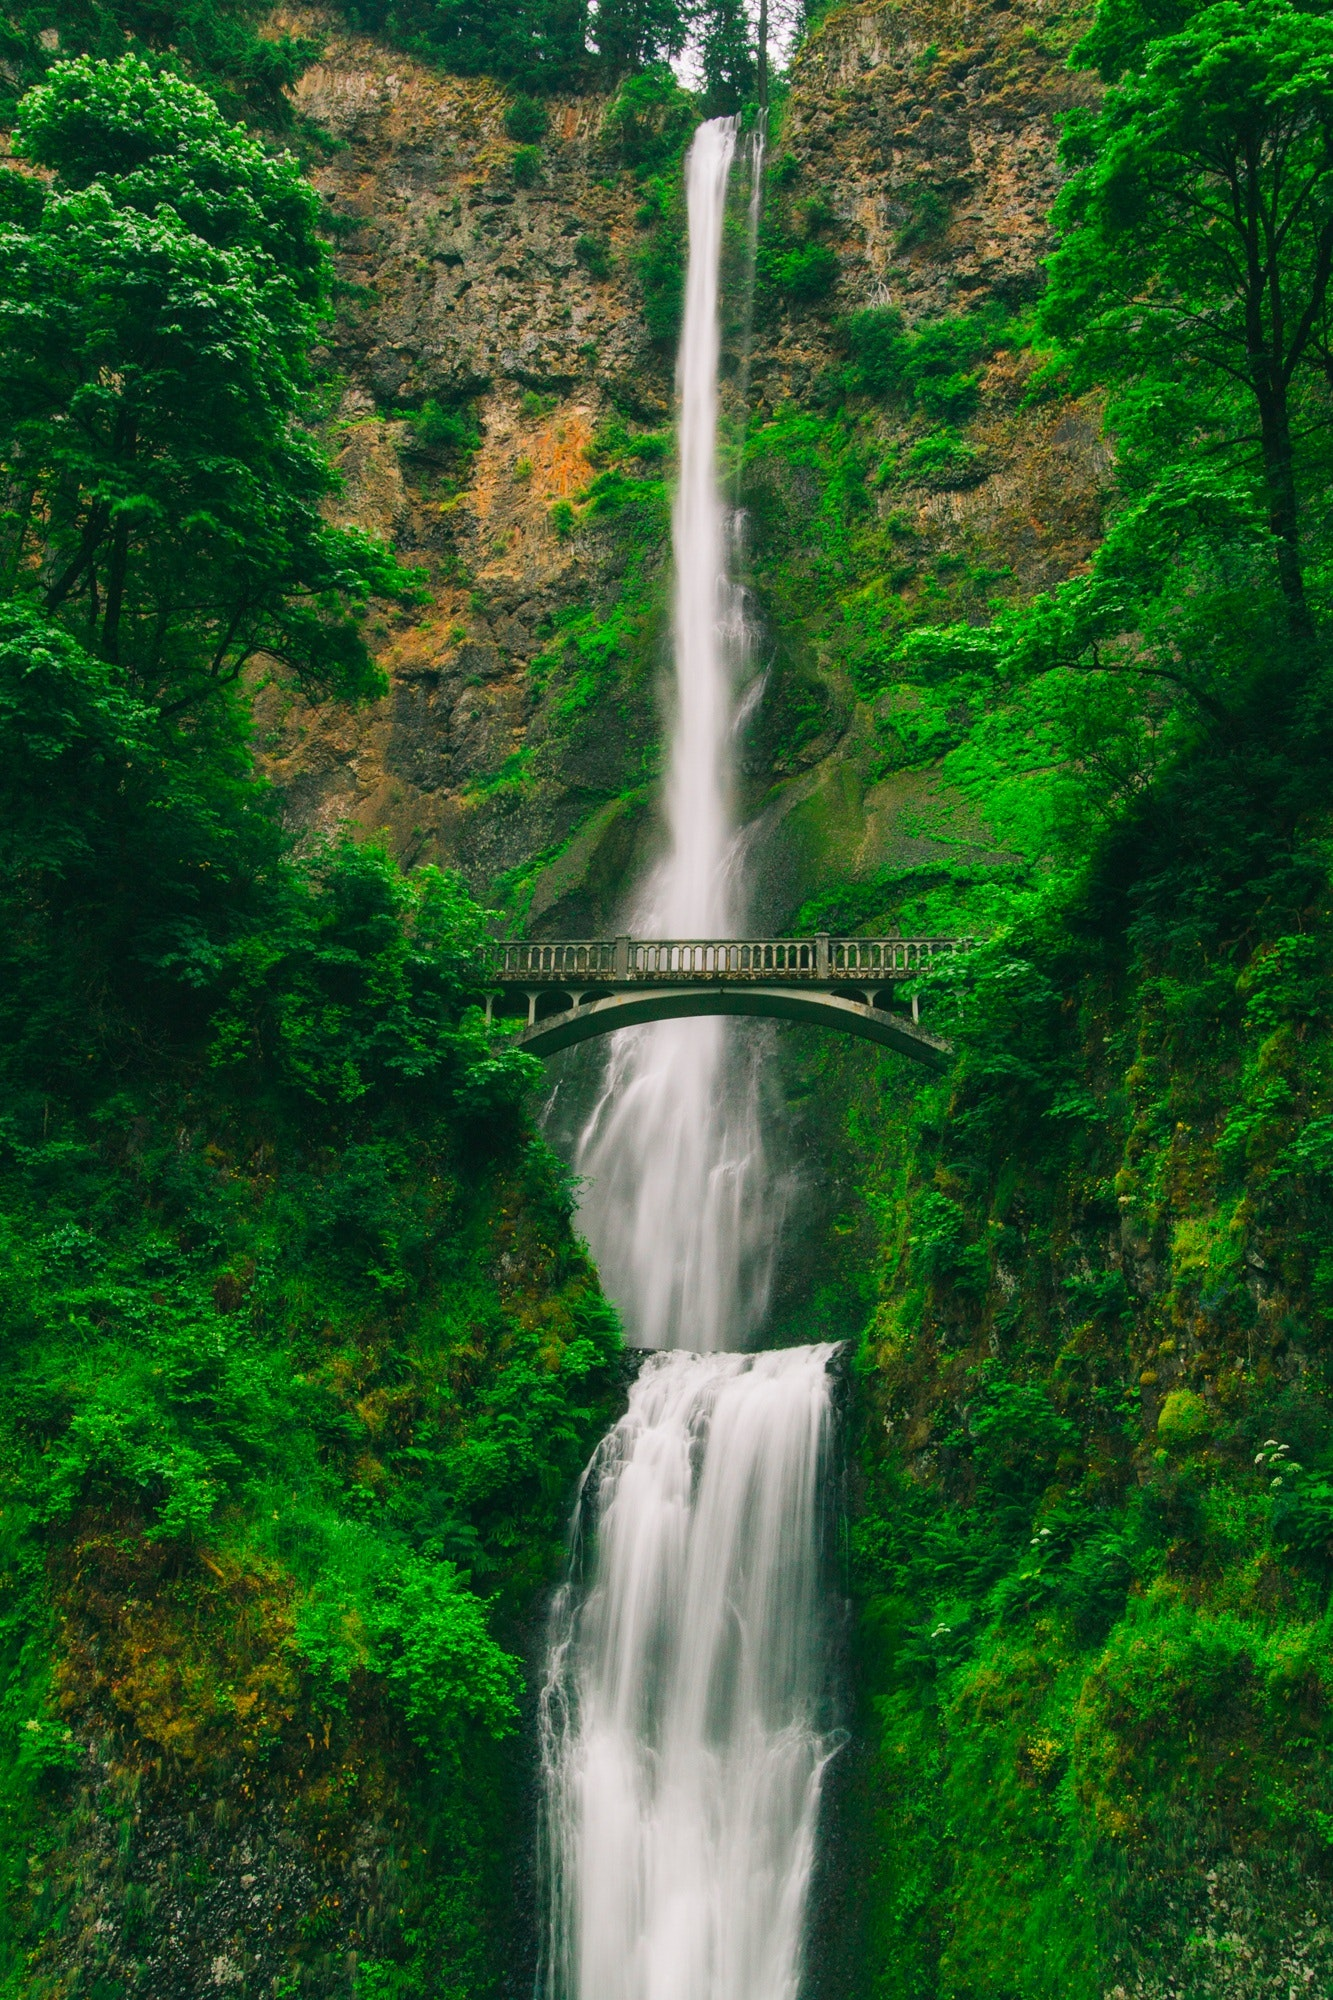 Fantastic Wallpaper Mobile Waterfall - pexels-photo-358457  Photograph_526183.jpg\u0026fm\u003djpg